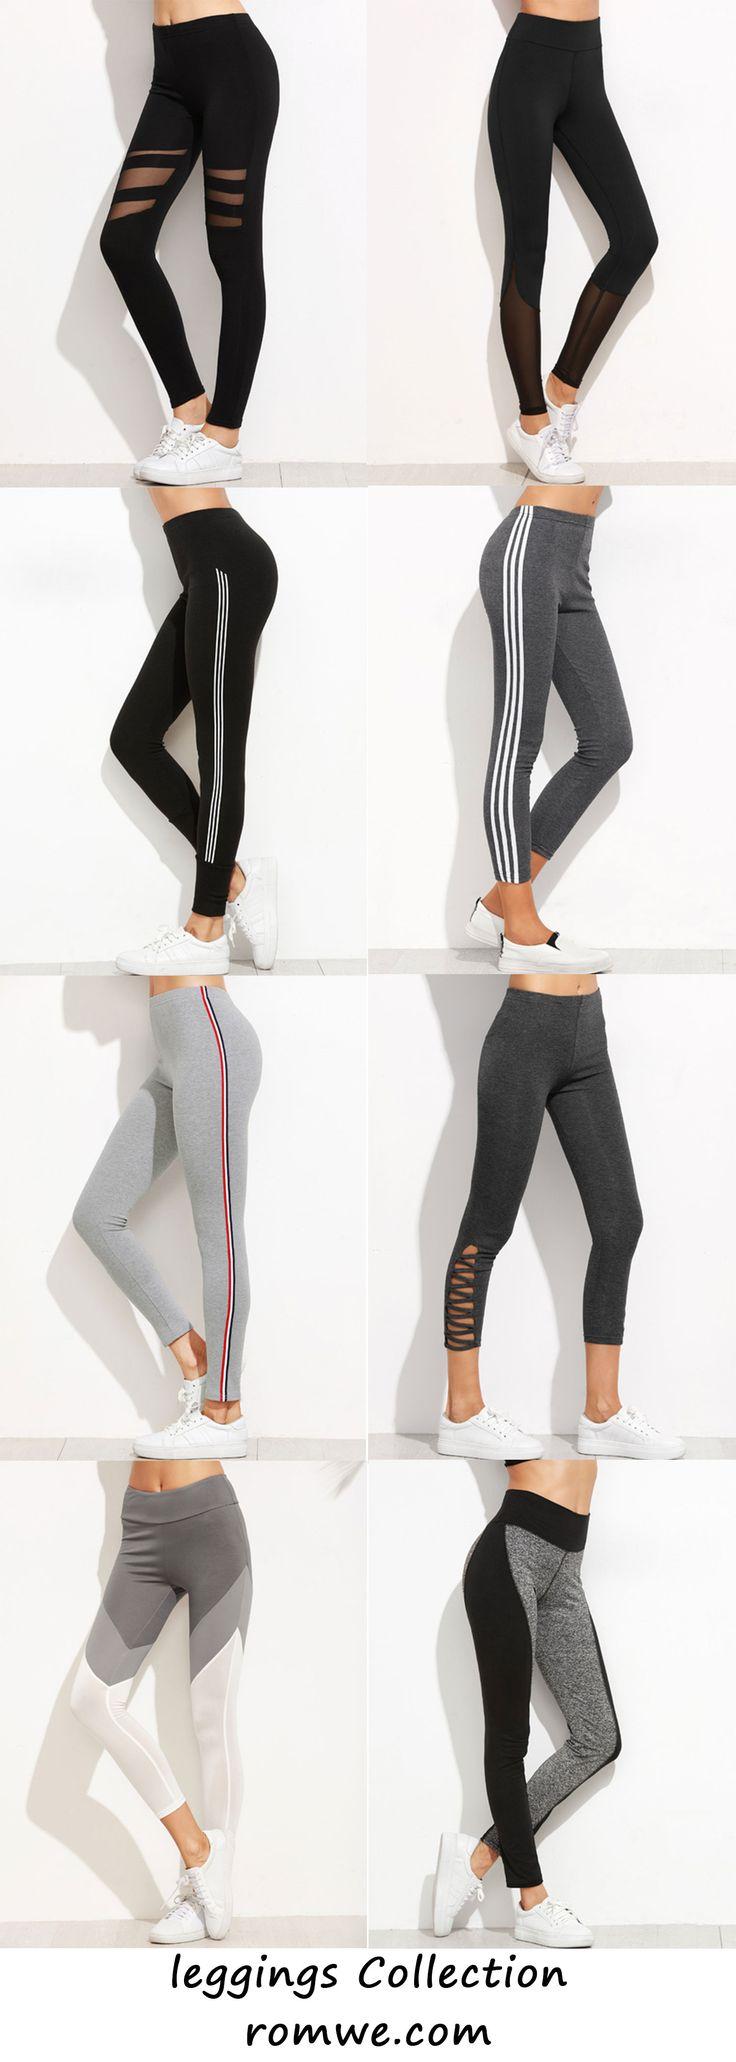 Legging Collection 2016 - romwe.com